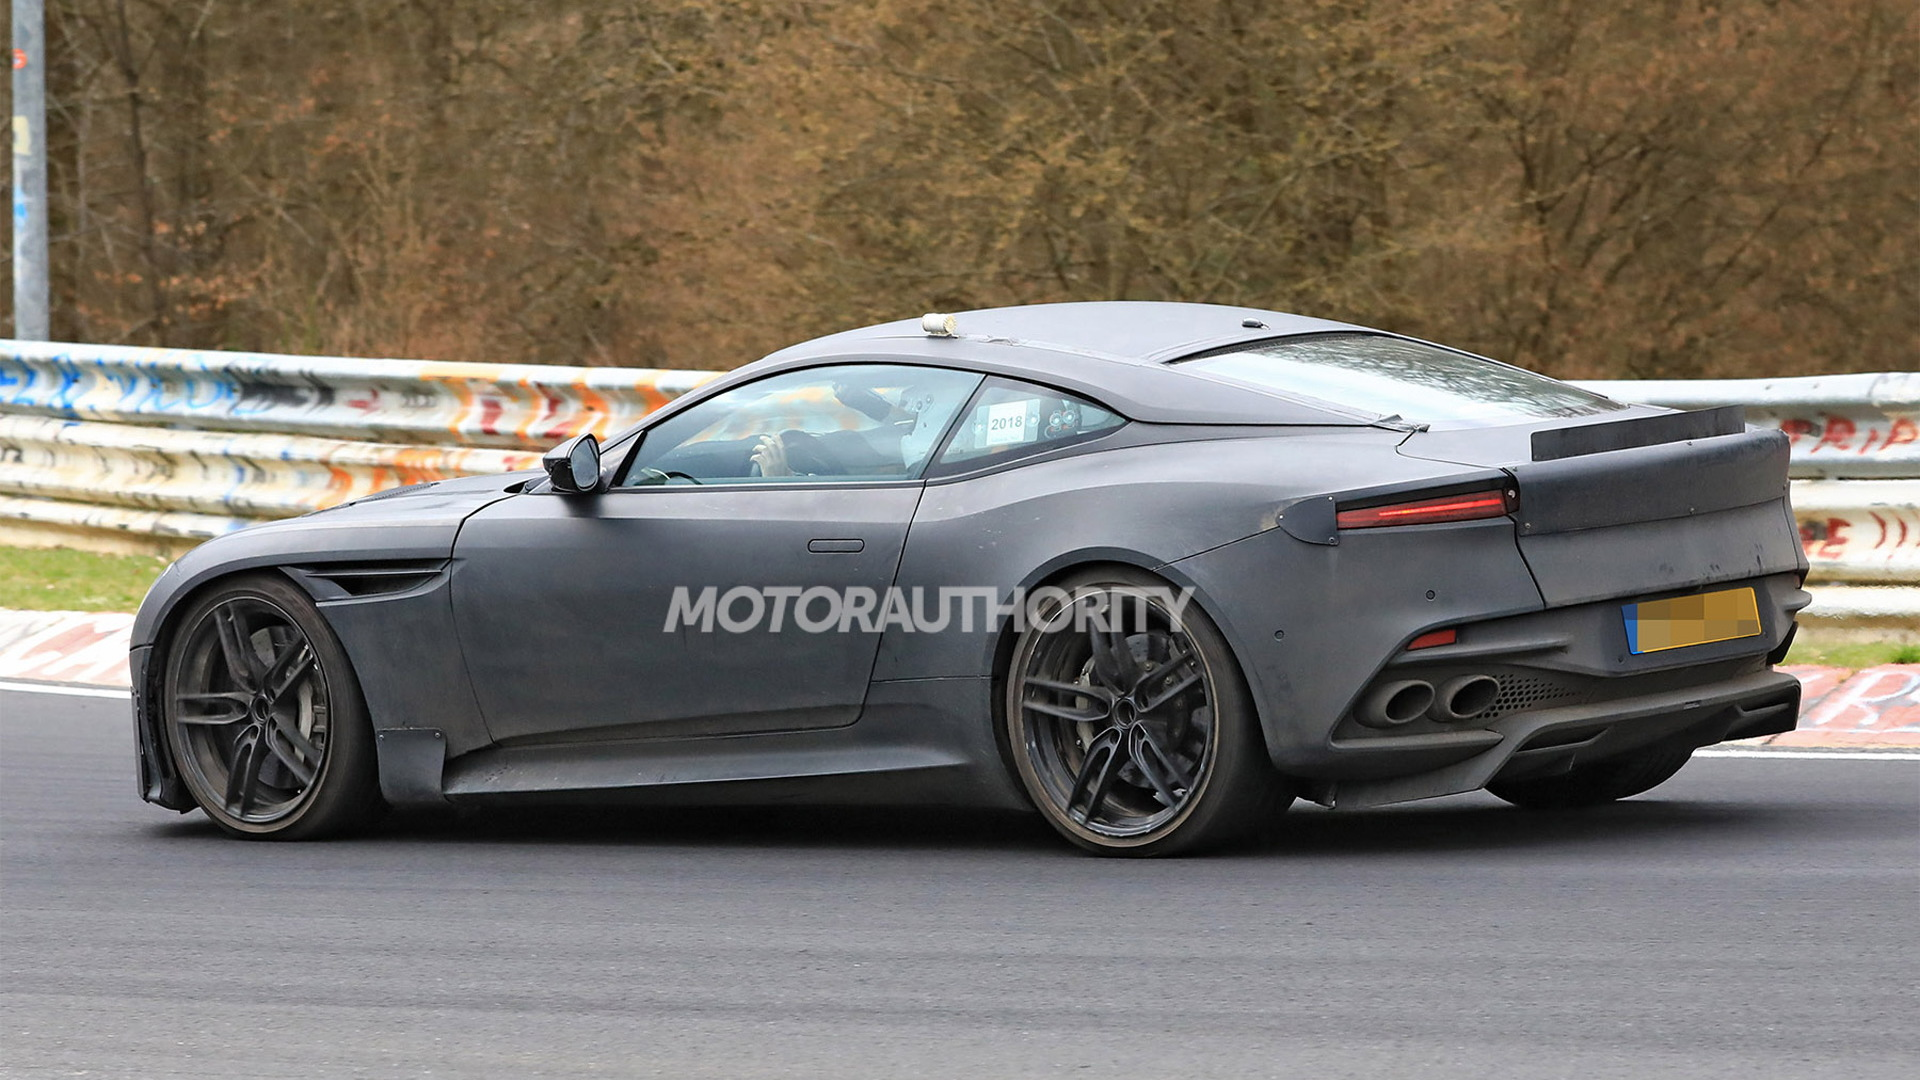 2020 Aston Martin DBS Superleggera spy shots - Image via S. Baldauf/SB-Medien